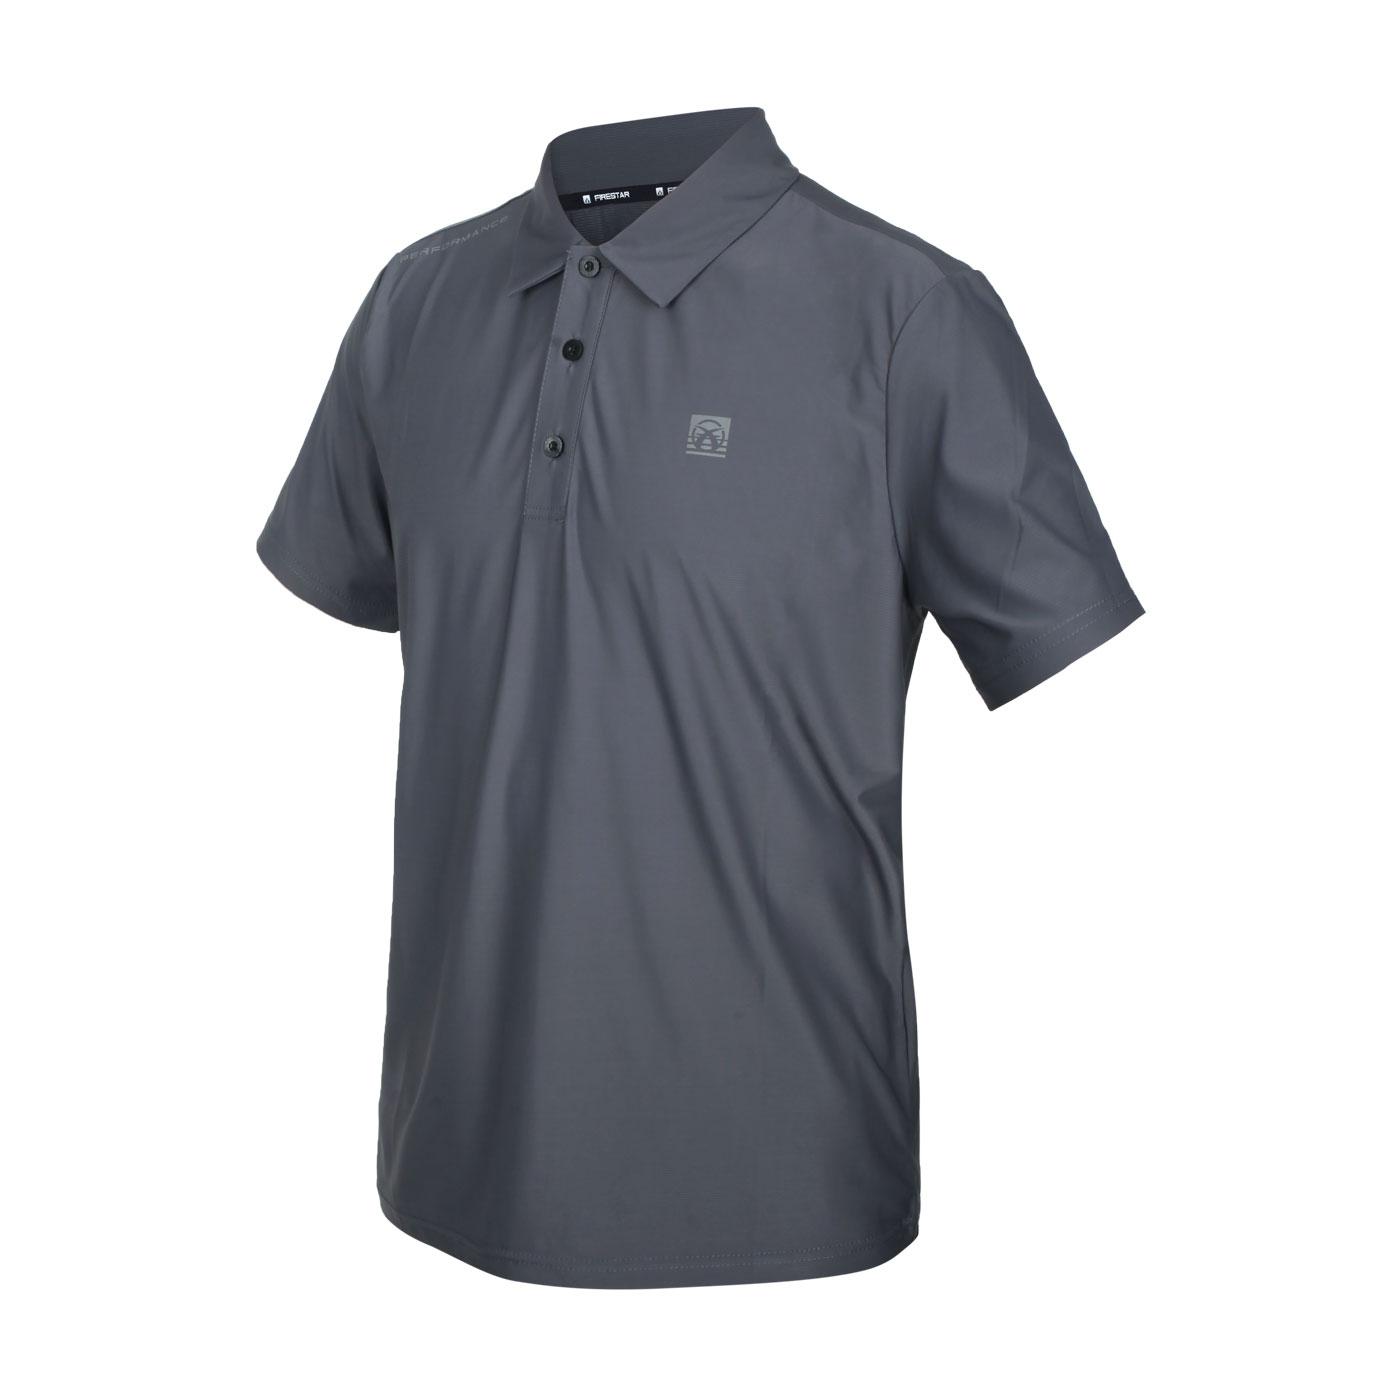 FIRESTAR 男款彈性高爾夫短袖POLO衫 D1752-15 - 深灰銀